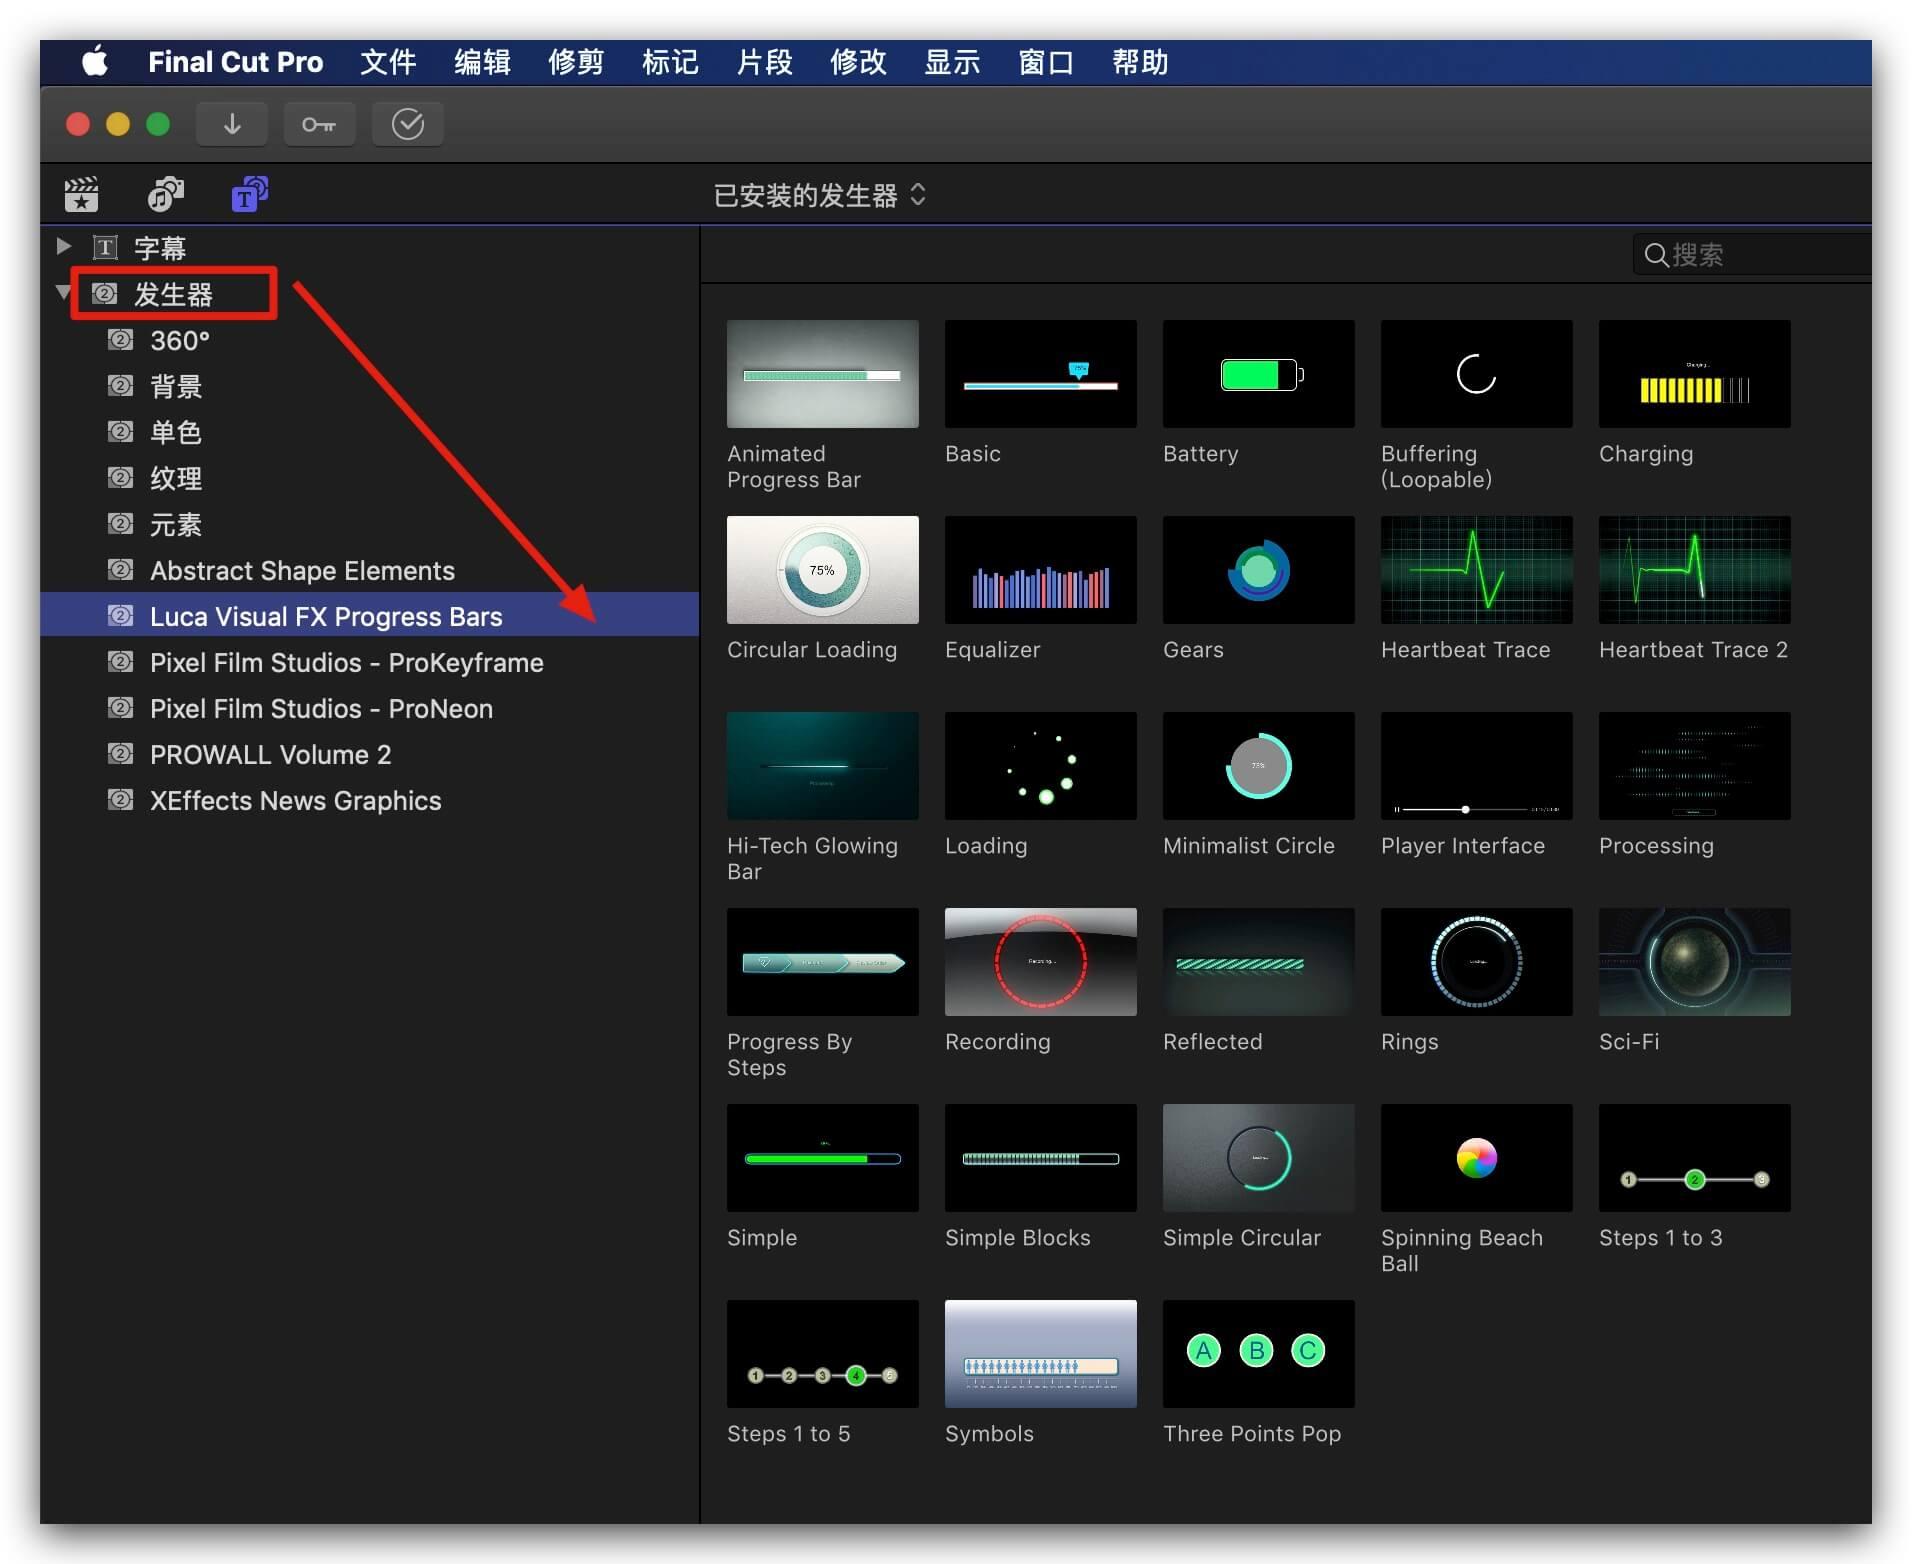 Fcpx插件 28个载入进度条充电步骤百分比信息图表预设 Luca Visual FX Progress Bars